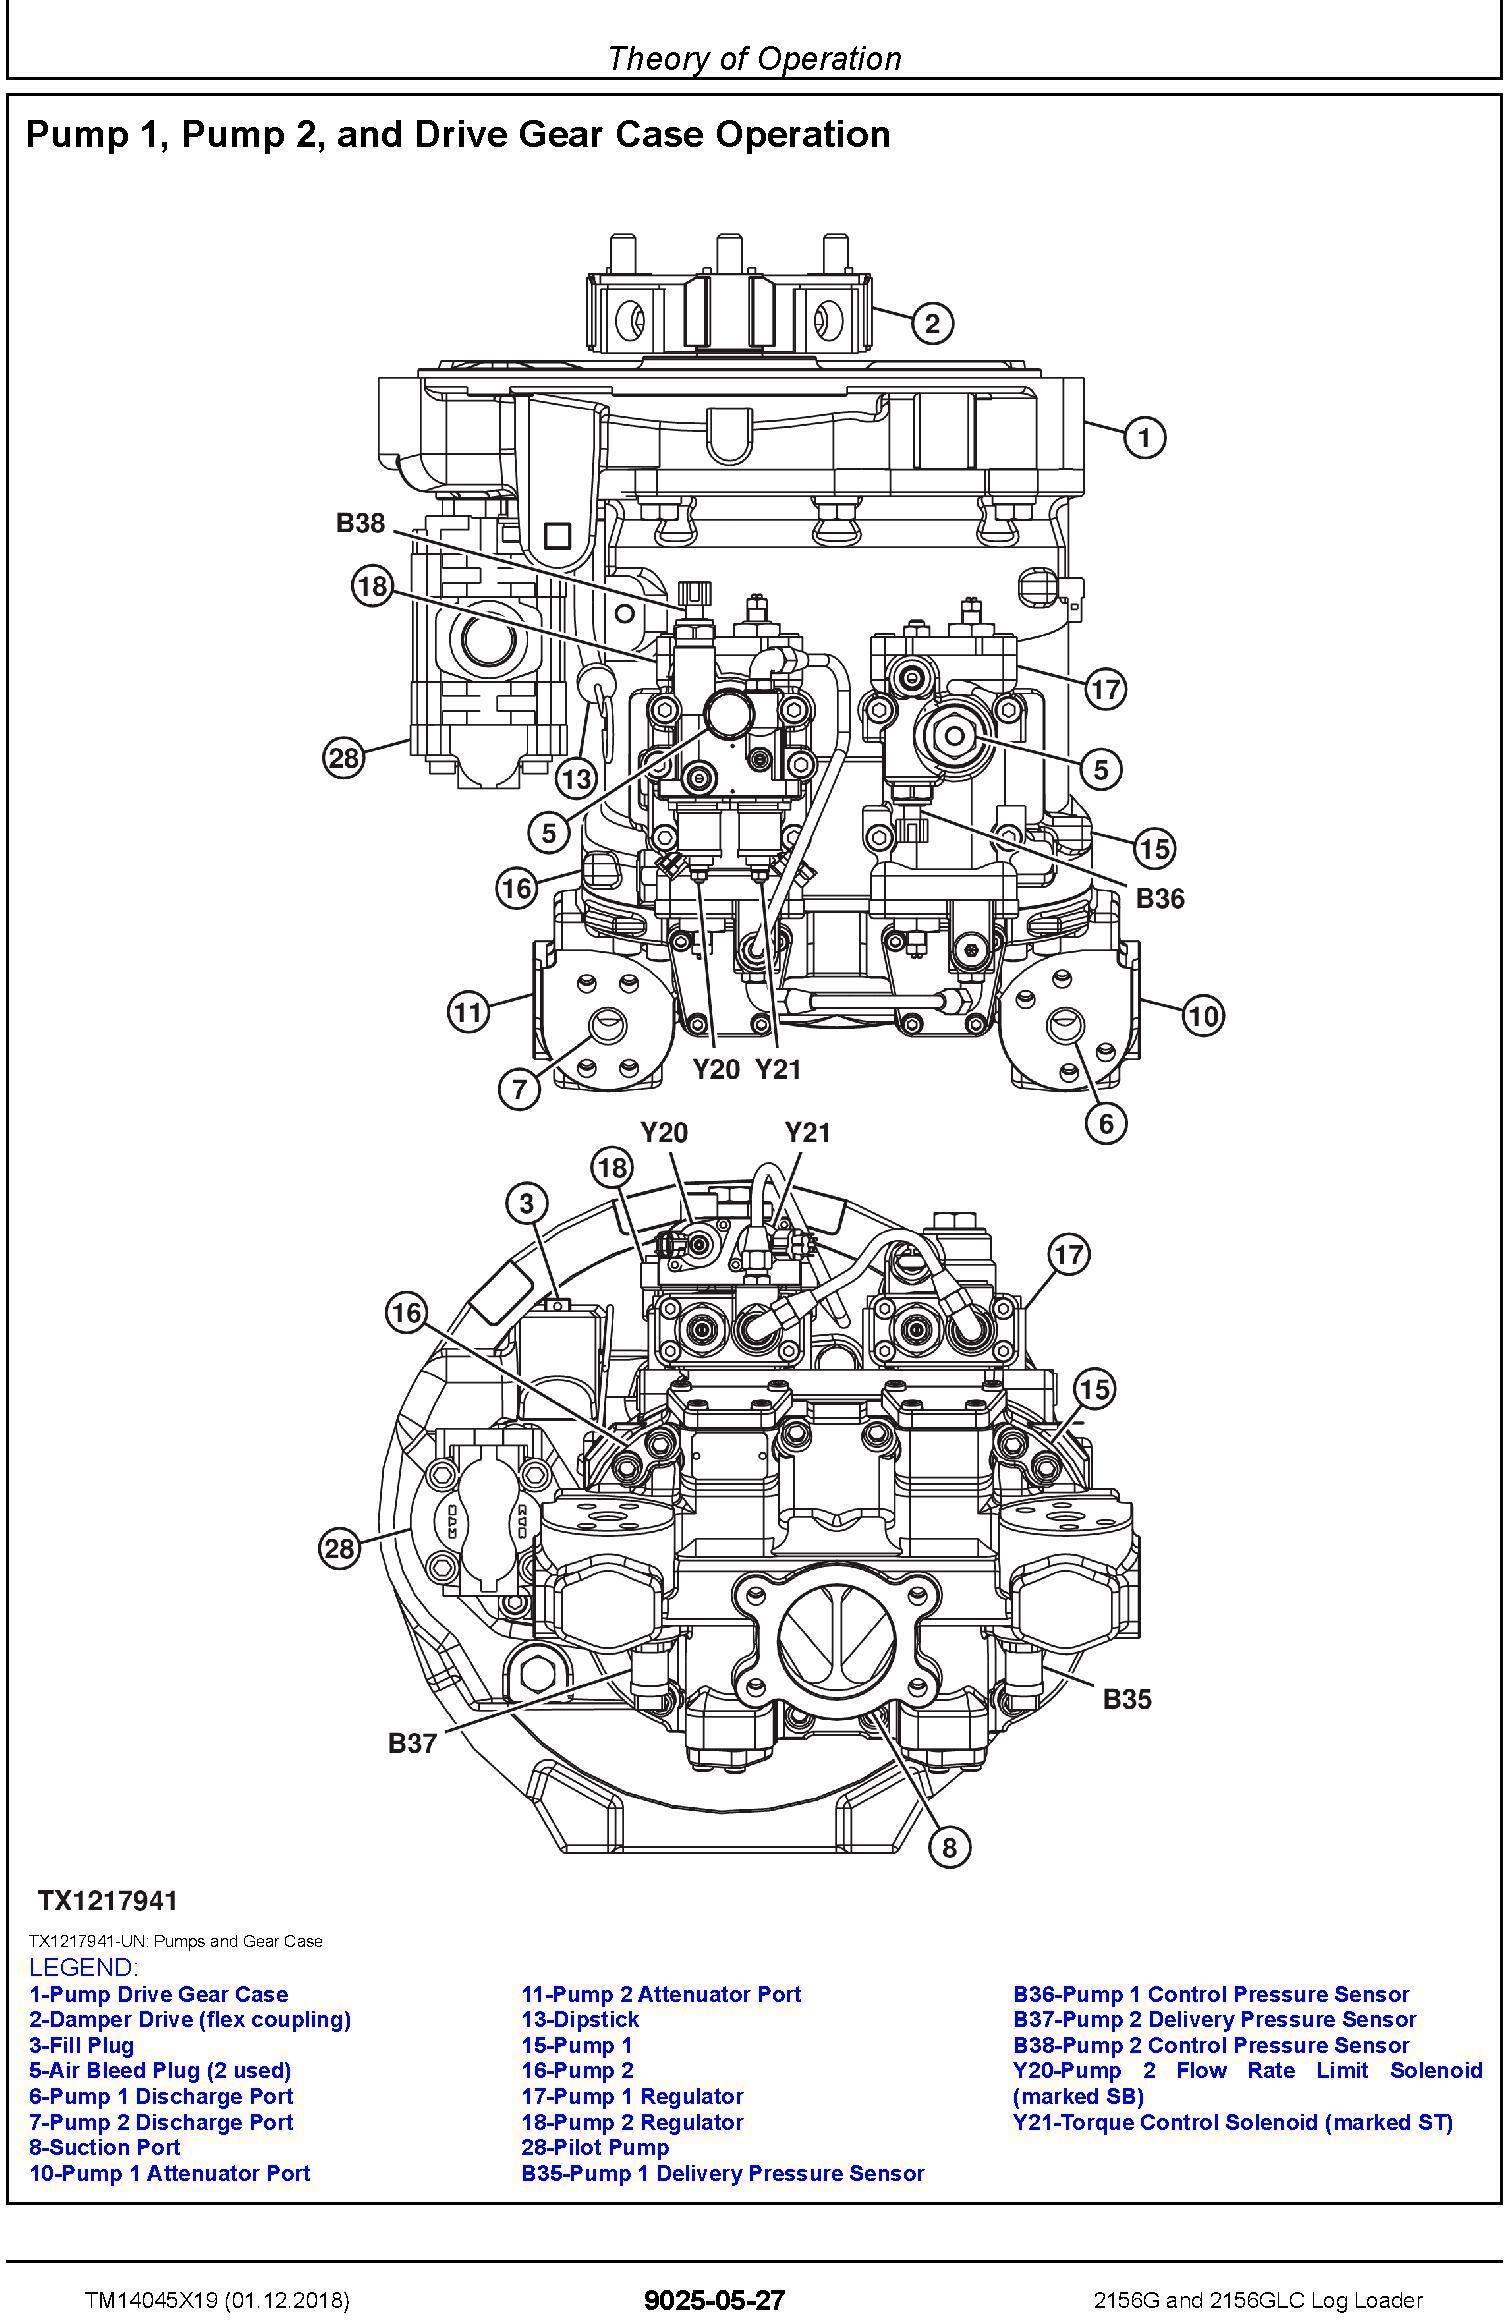 John Deere 2156G, 2156GLC (SN. F216001-) Log Loader Operation & Test Technical Manual (TM14045X19) - 1